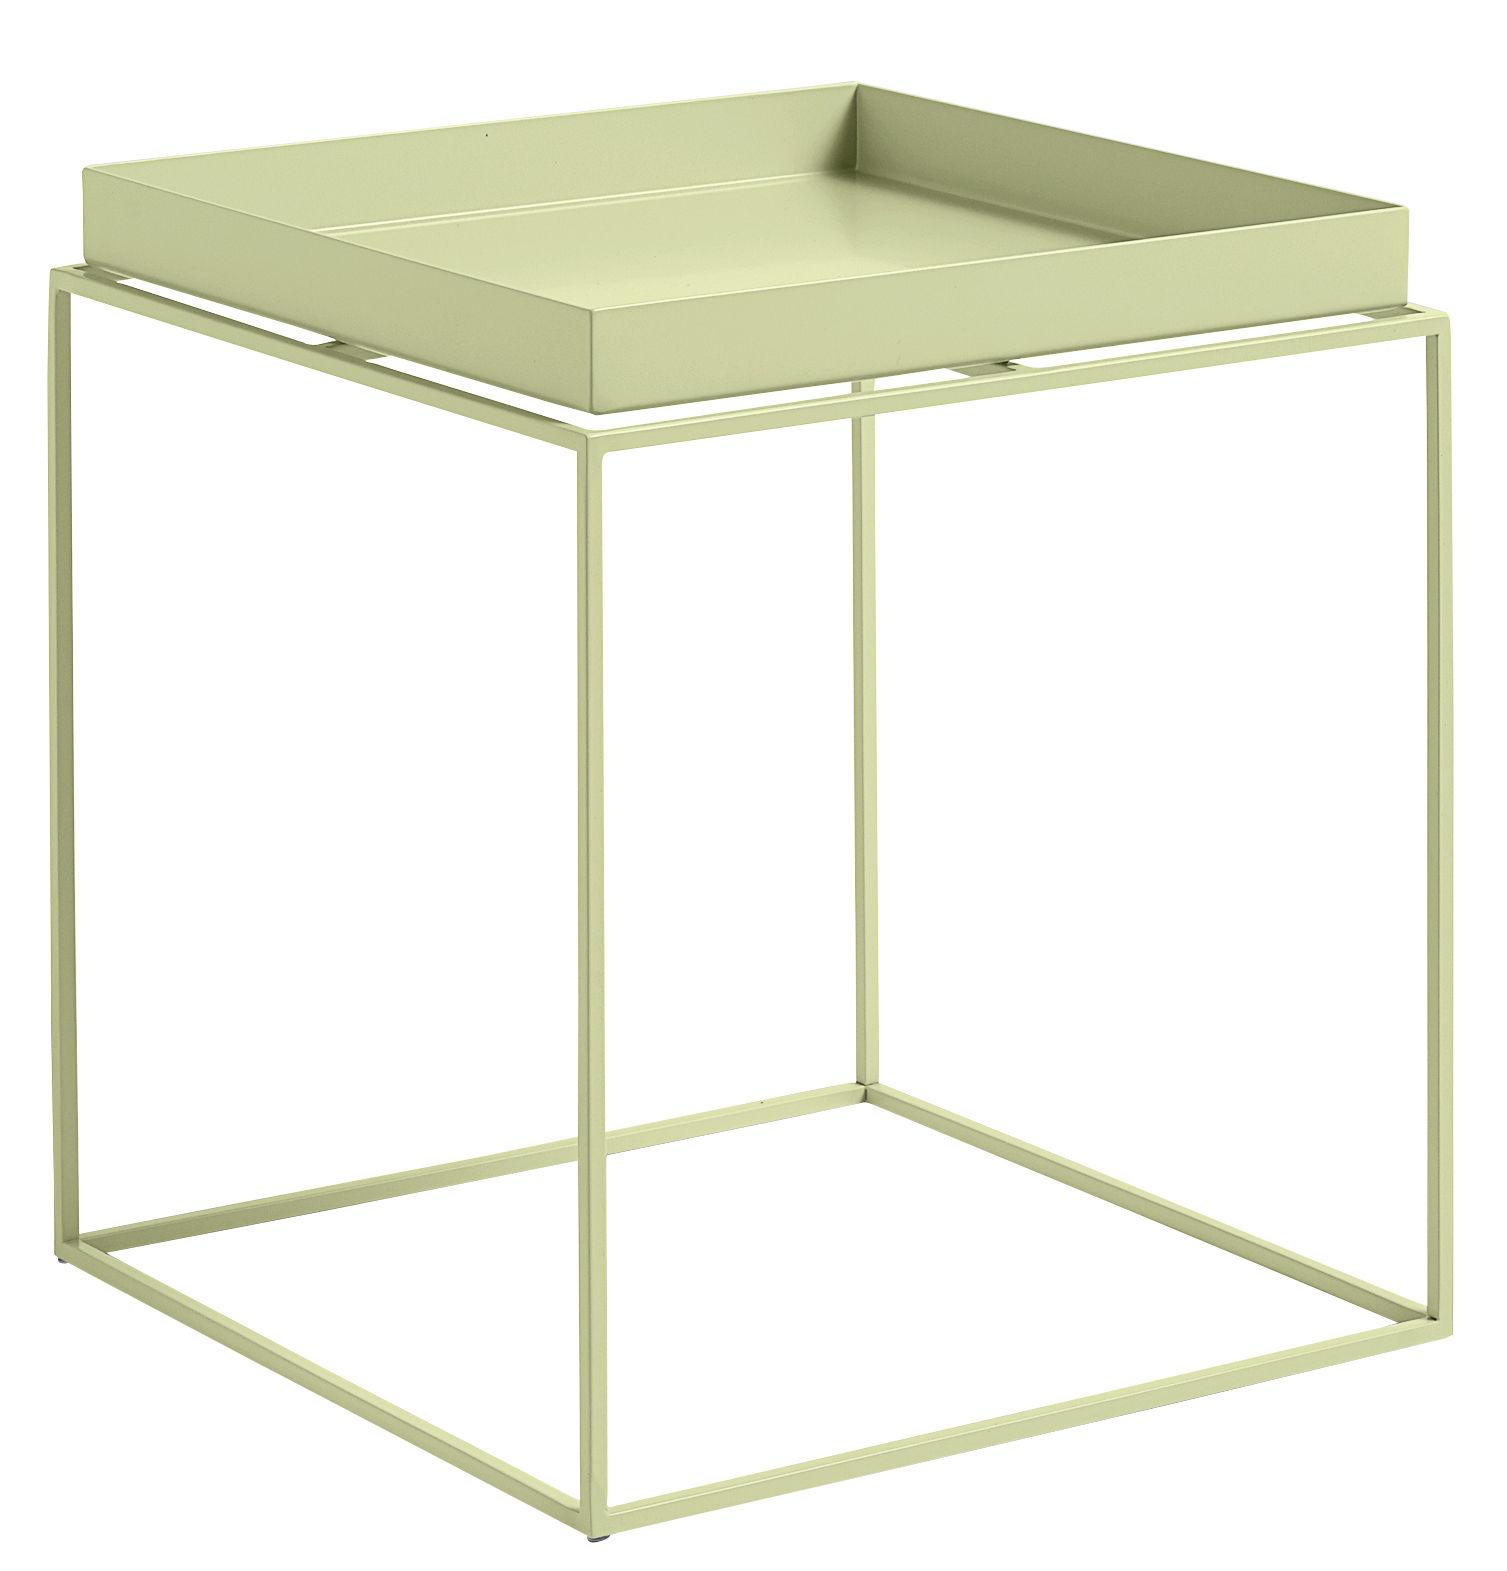 tray h 40 cm quadratisch 40 x 40 cm hay couchtisch. Black Bedroom Furniture Sets. Home Design Ideas